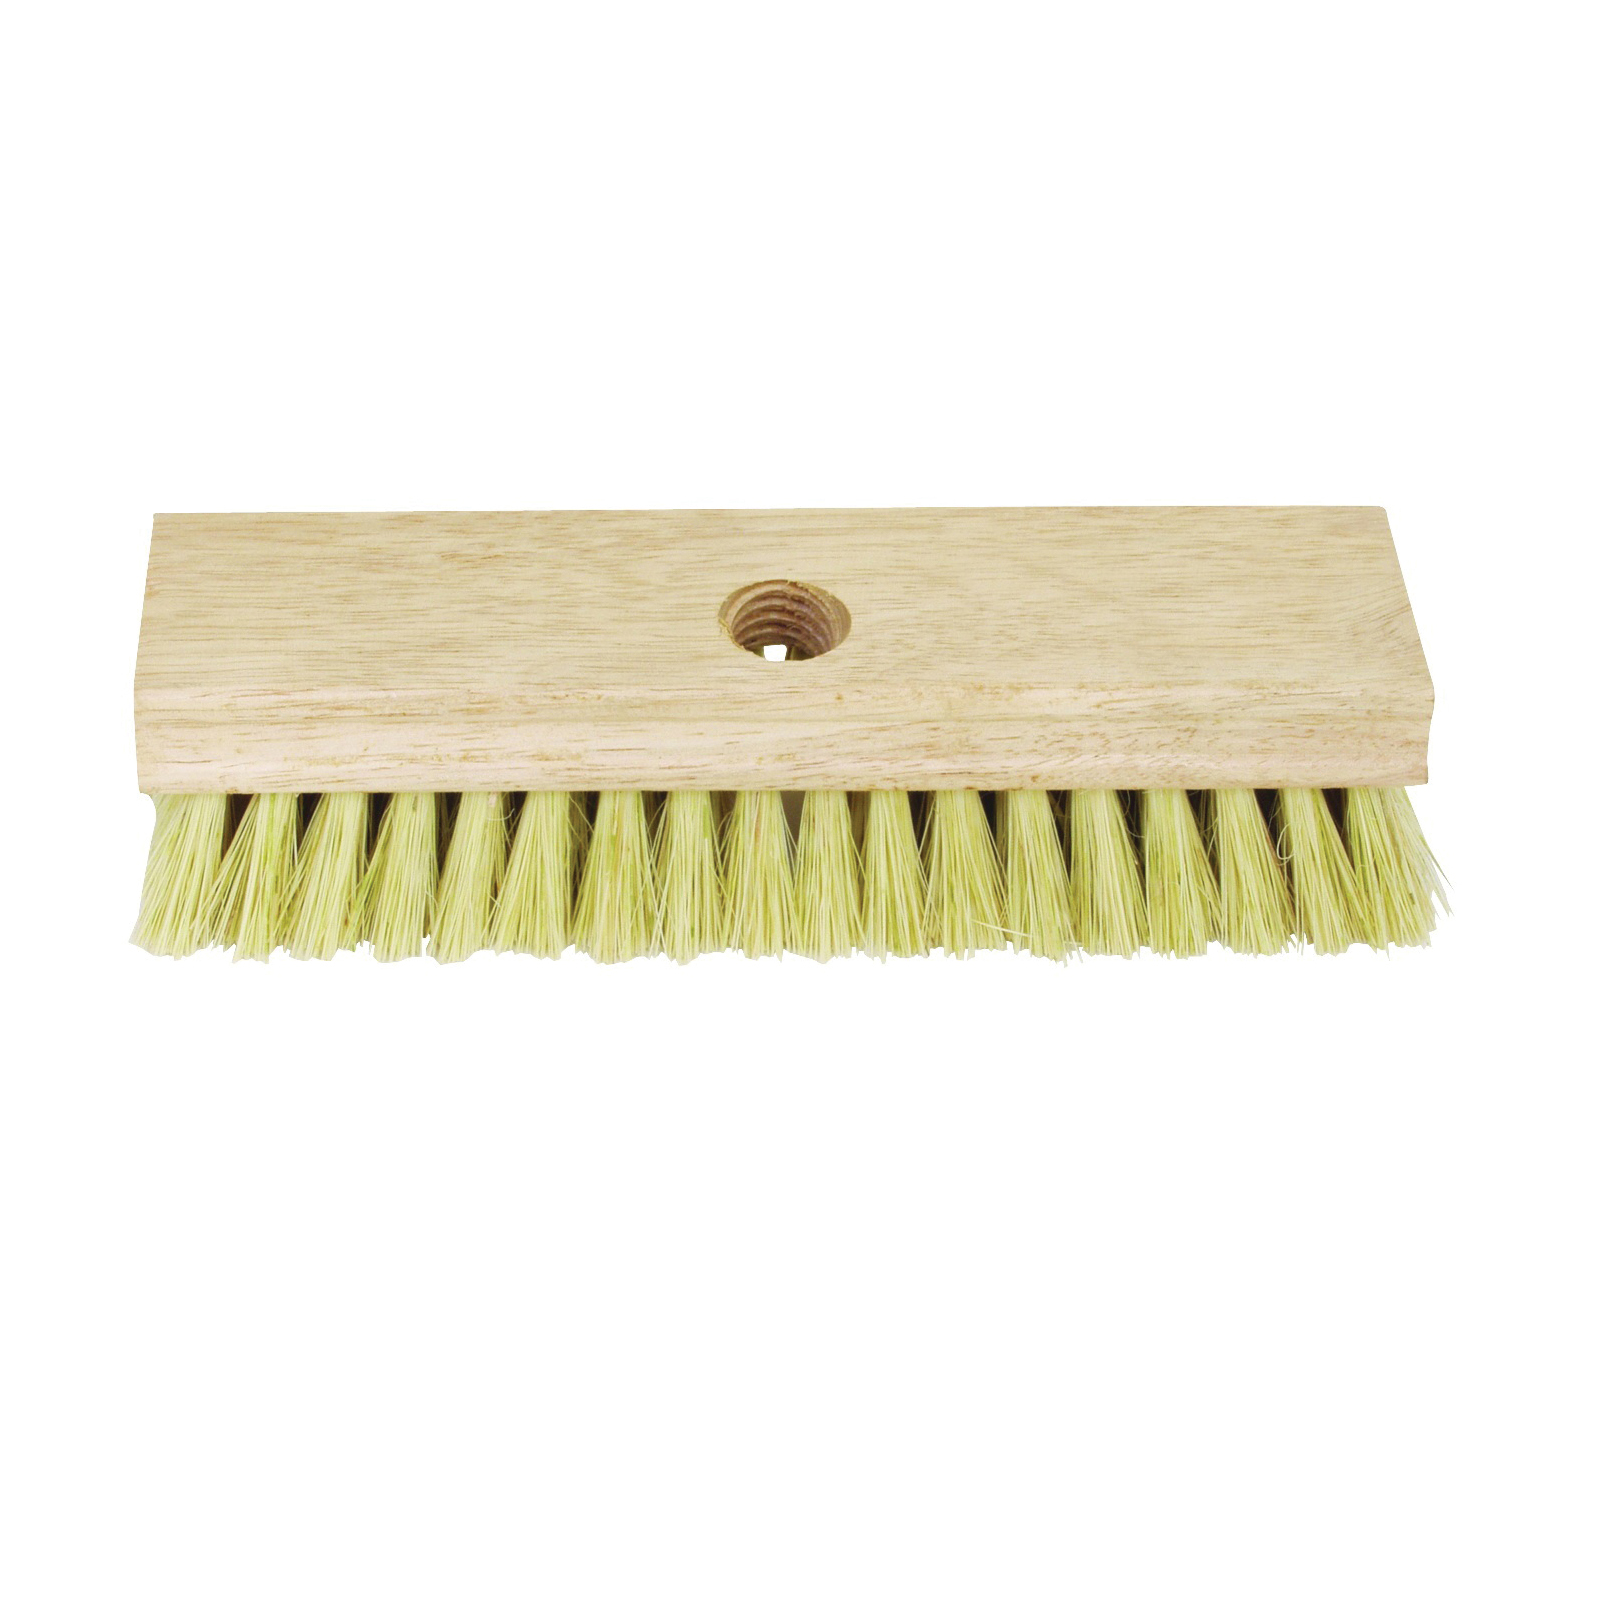 Picture of DQB 11643 Acid Scrub Brush, 8 in Brush, 1-1/16 in L Trim, Hardwood Handle, 8 in OAL